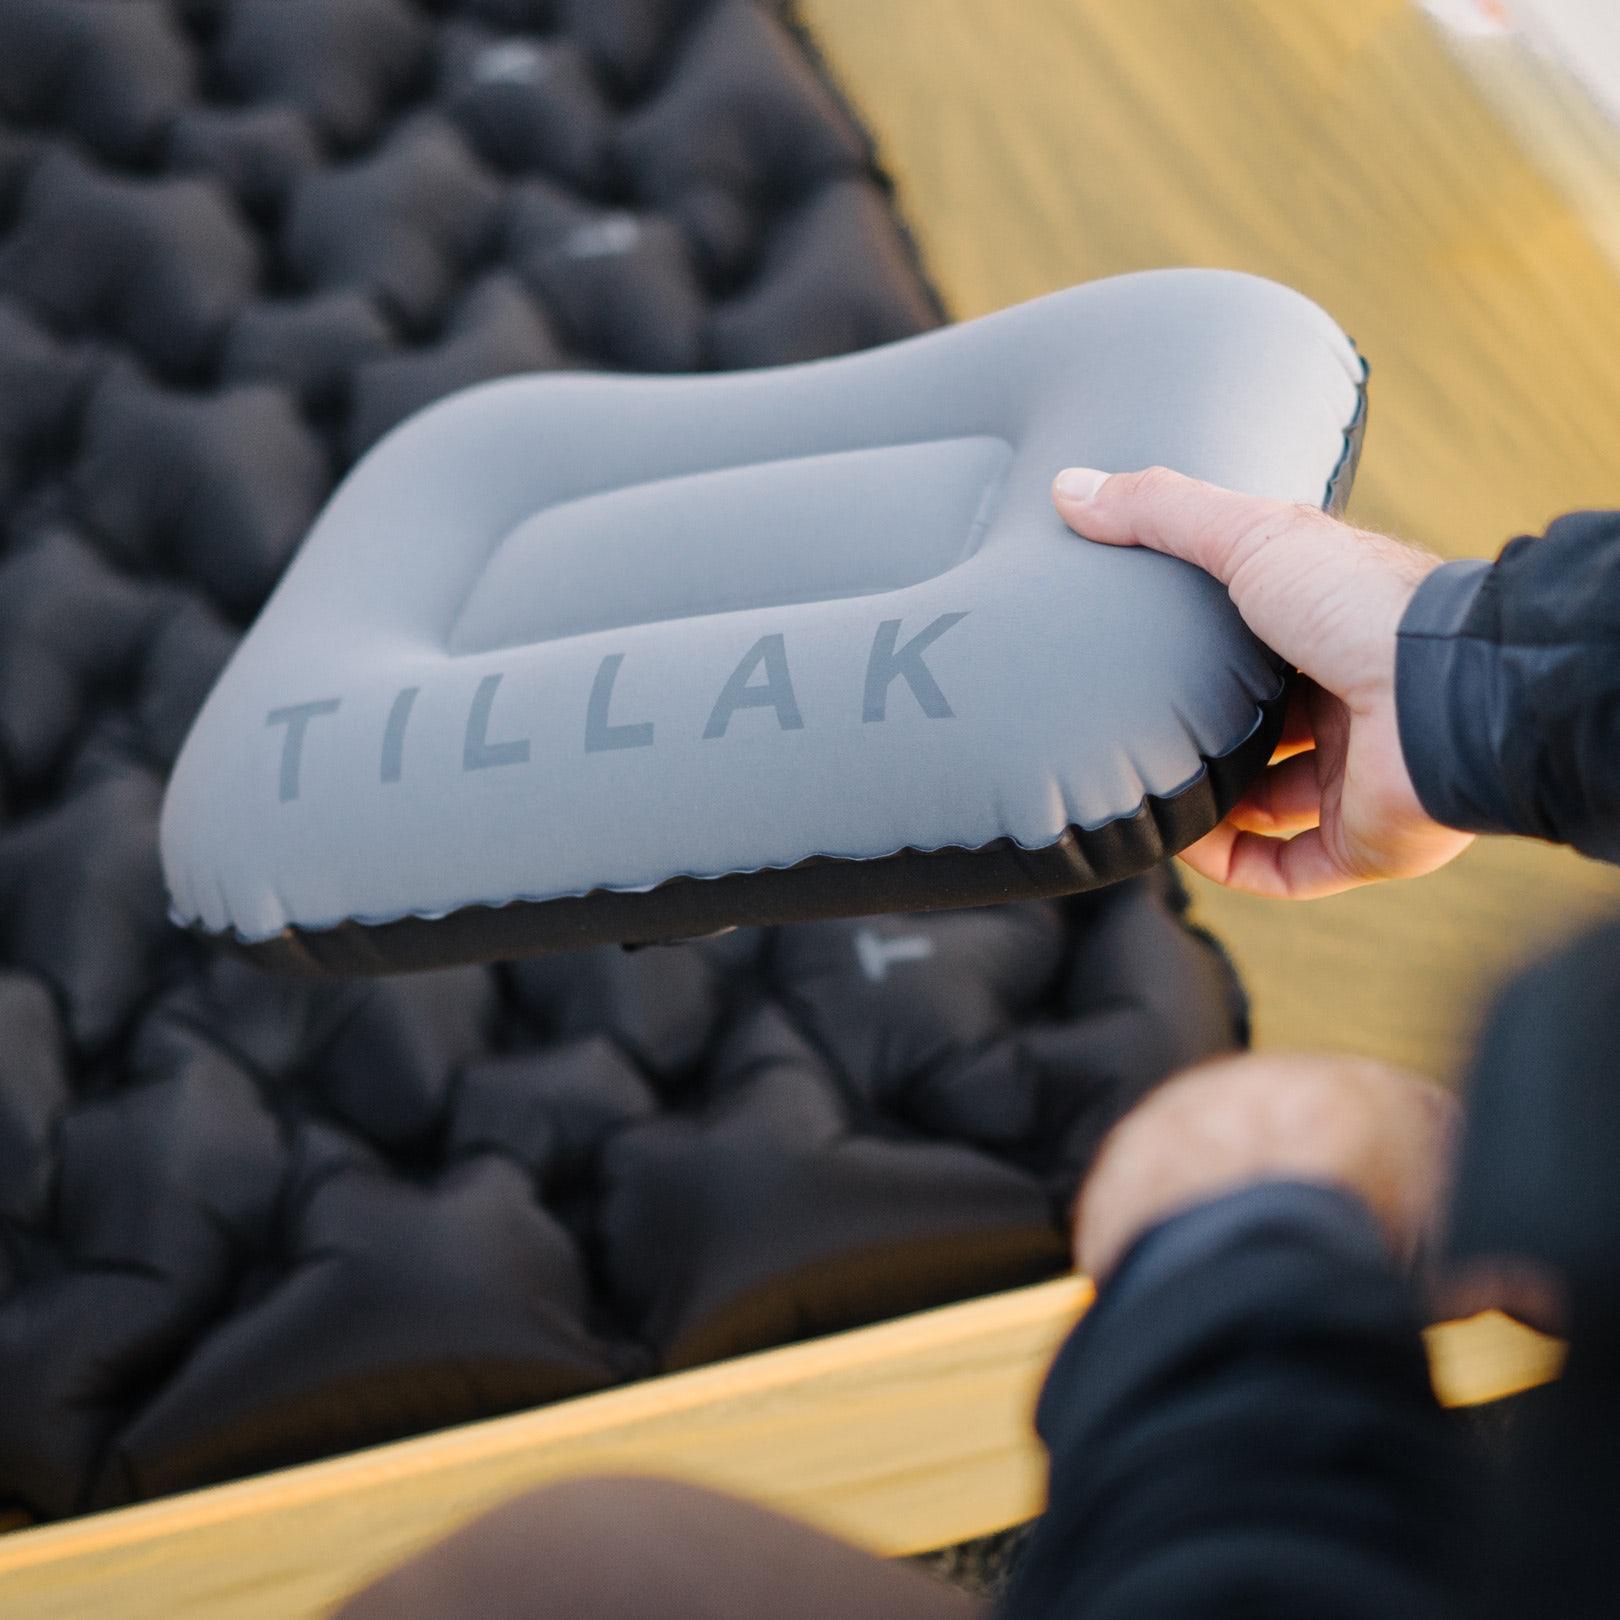 Tillak Bubo Inflatable Pillow